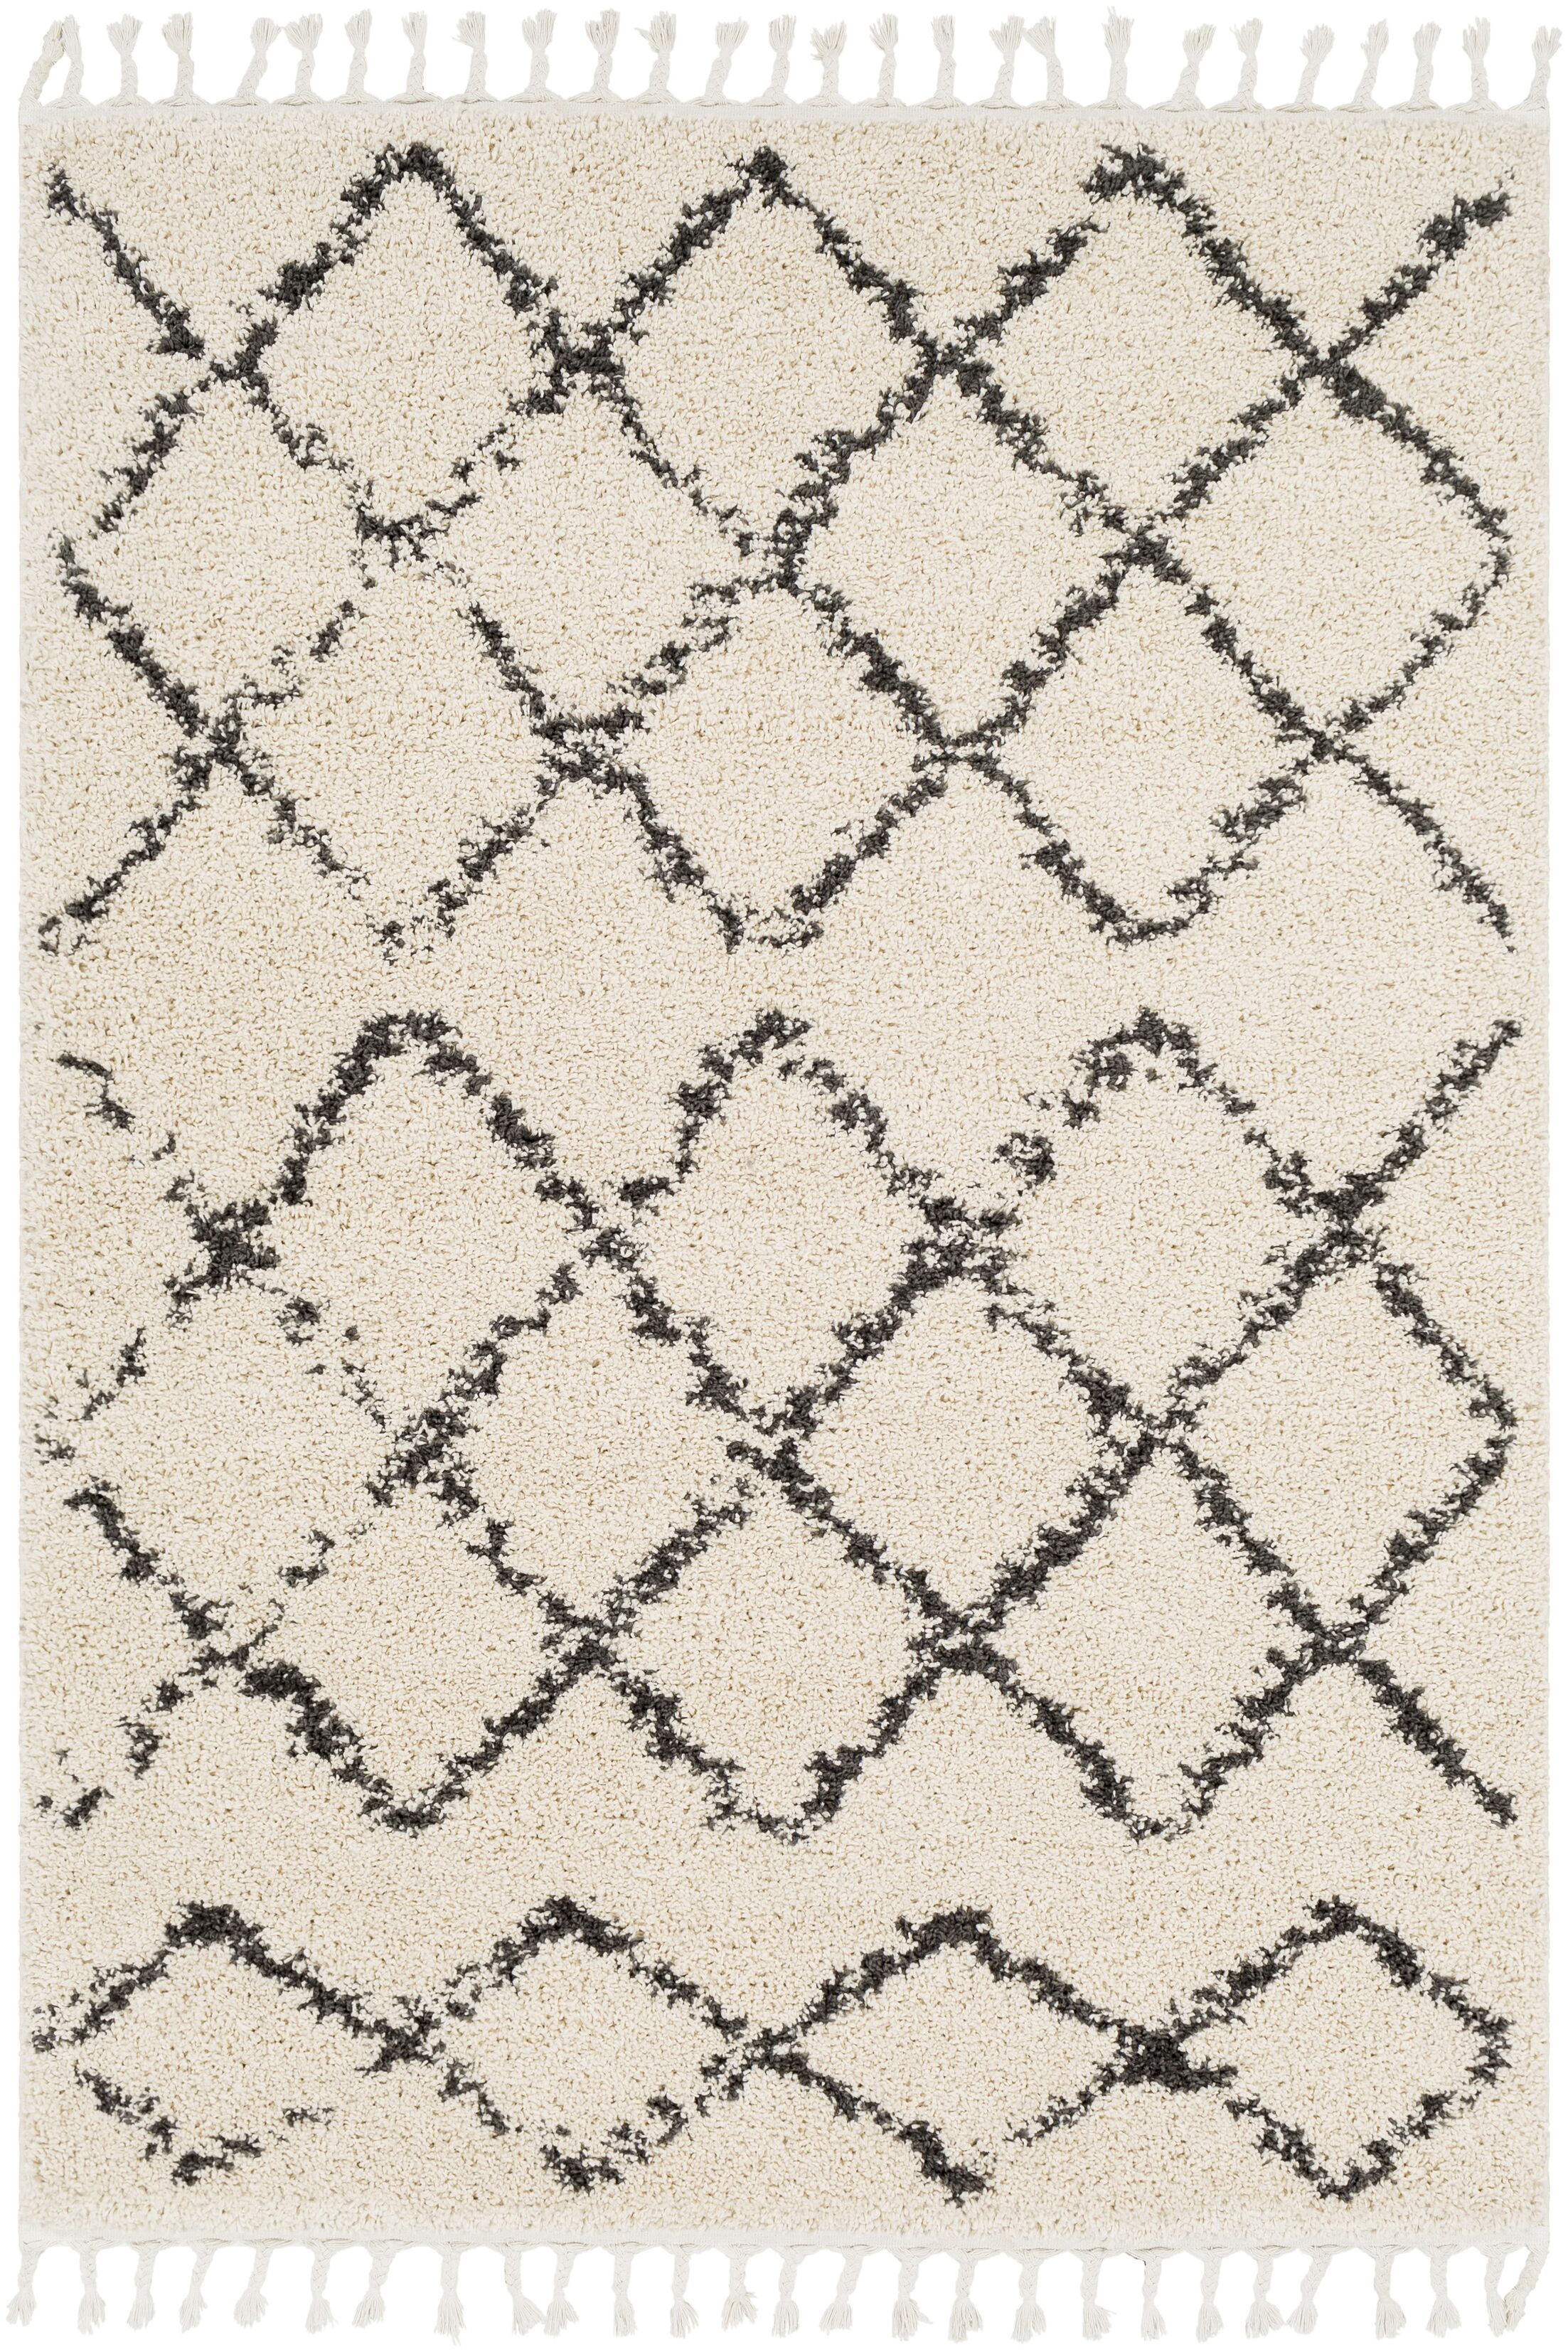 Roger Modern Bohemian Rectangle Beige/Charcoal Area Rug Rug Size: Rectangle 7'10